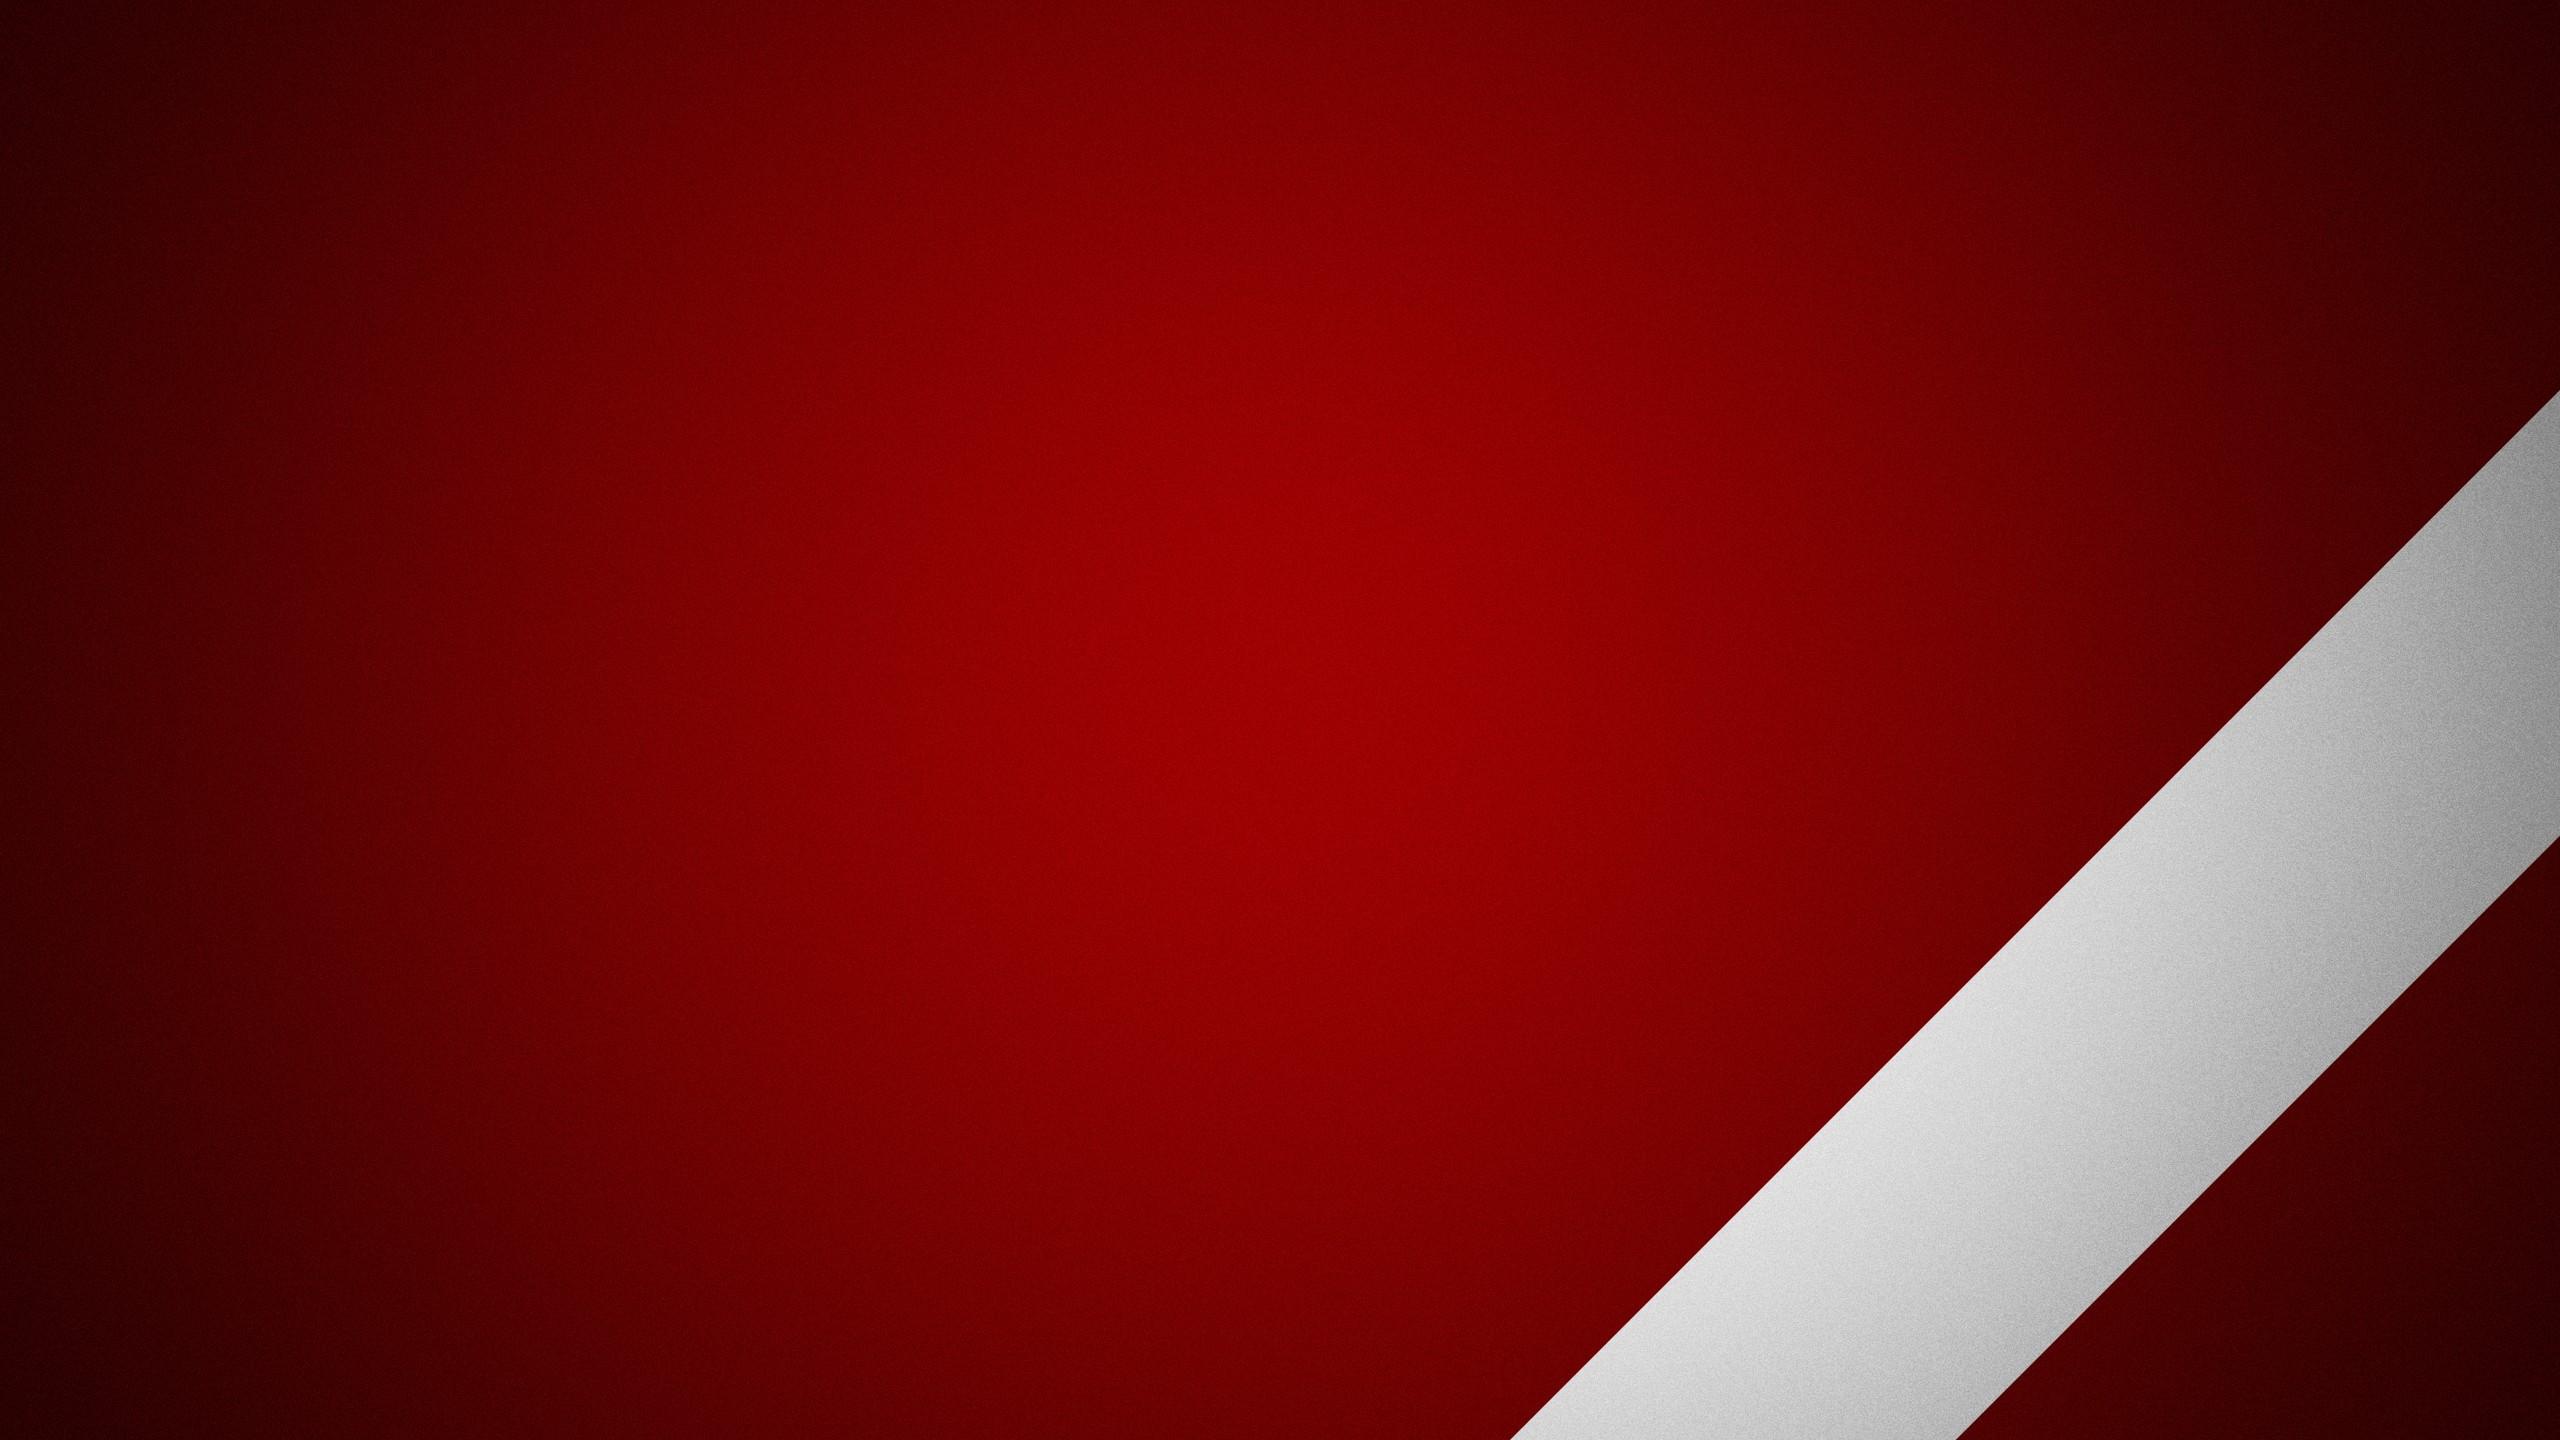 red white black wallpaper wallpapersafari. Black Bedroom Furniture Sets. Home Design Ideas